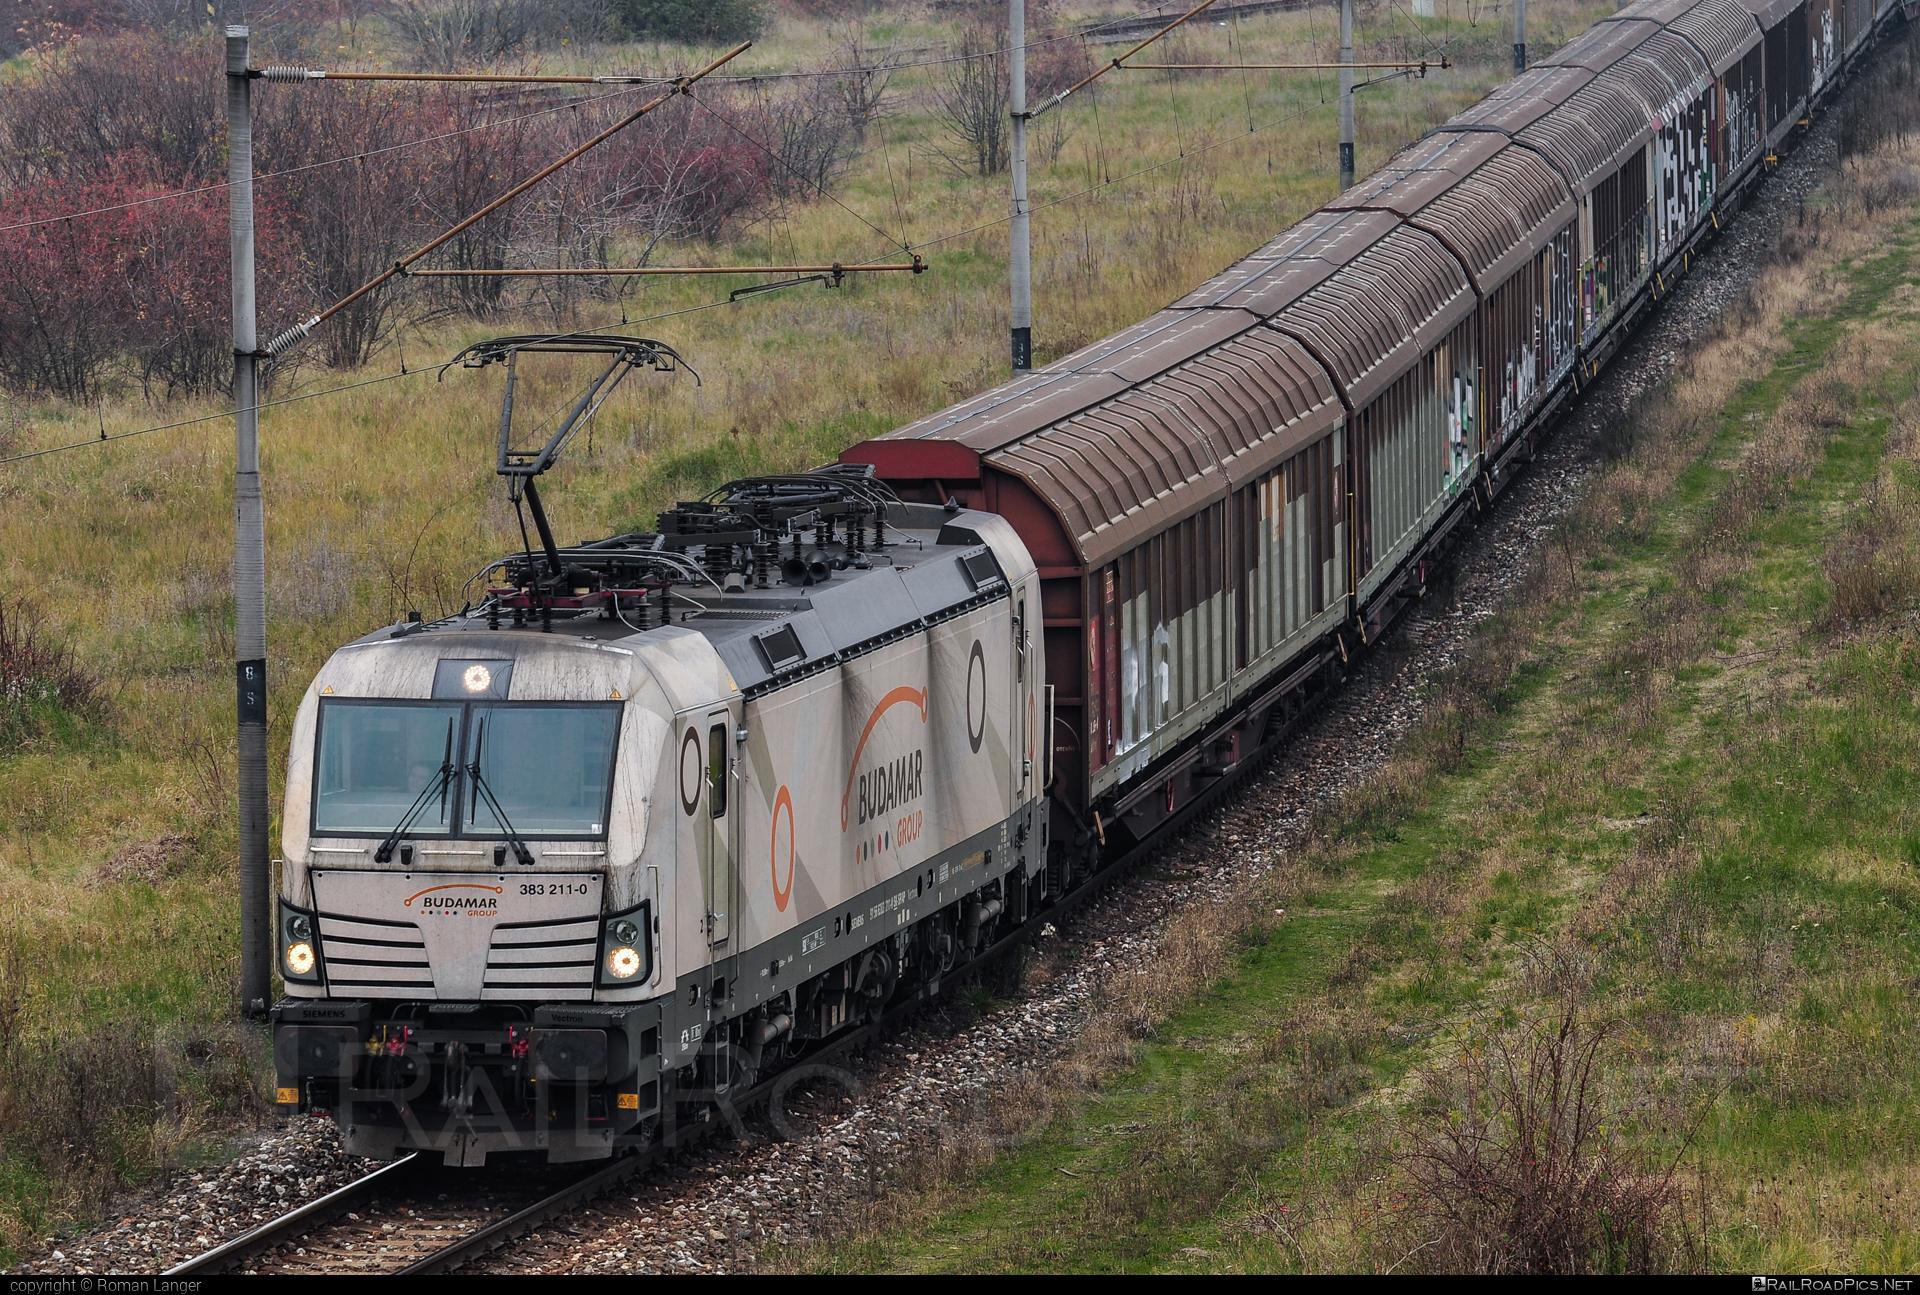 Siemens Vectron MS - 383 211-0 operated by LOKORAIL, a.s. #budamar #lokorail #lrl #siemens #siemensvectron #siemensvectronms #slovenskaplavbaapristavy #slovenskaplavbaapristavyas #spap #vectron #vectronms